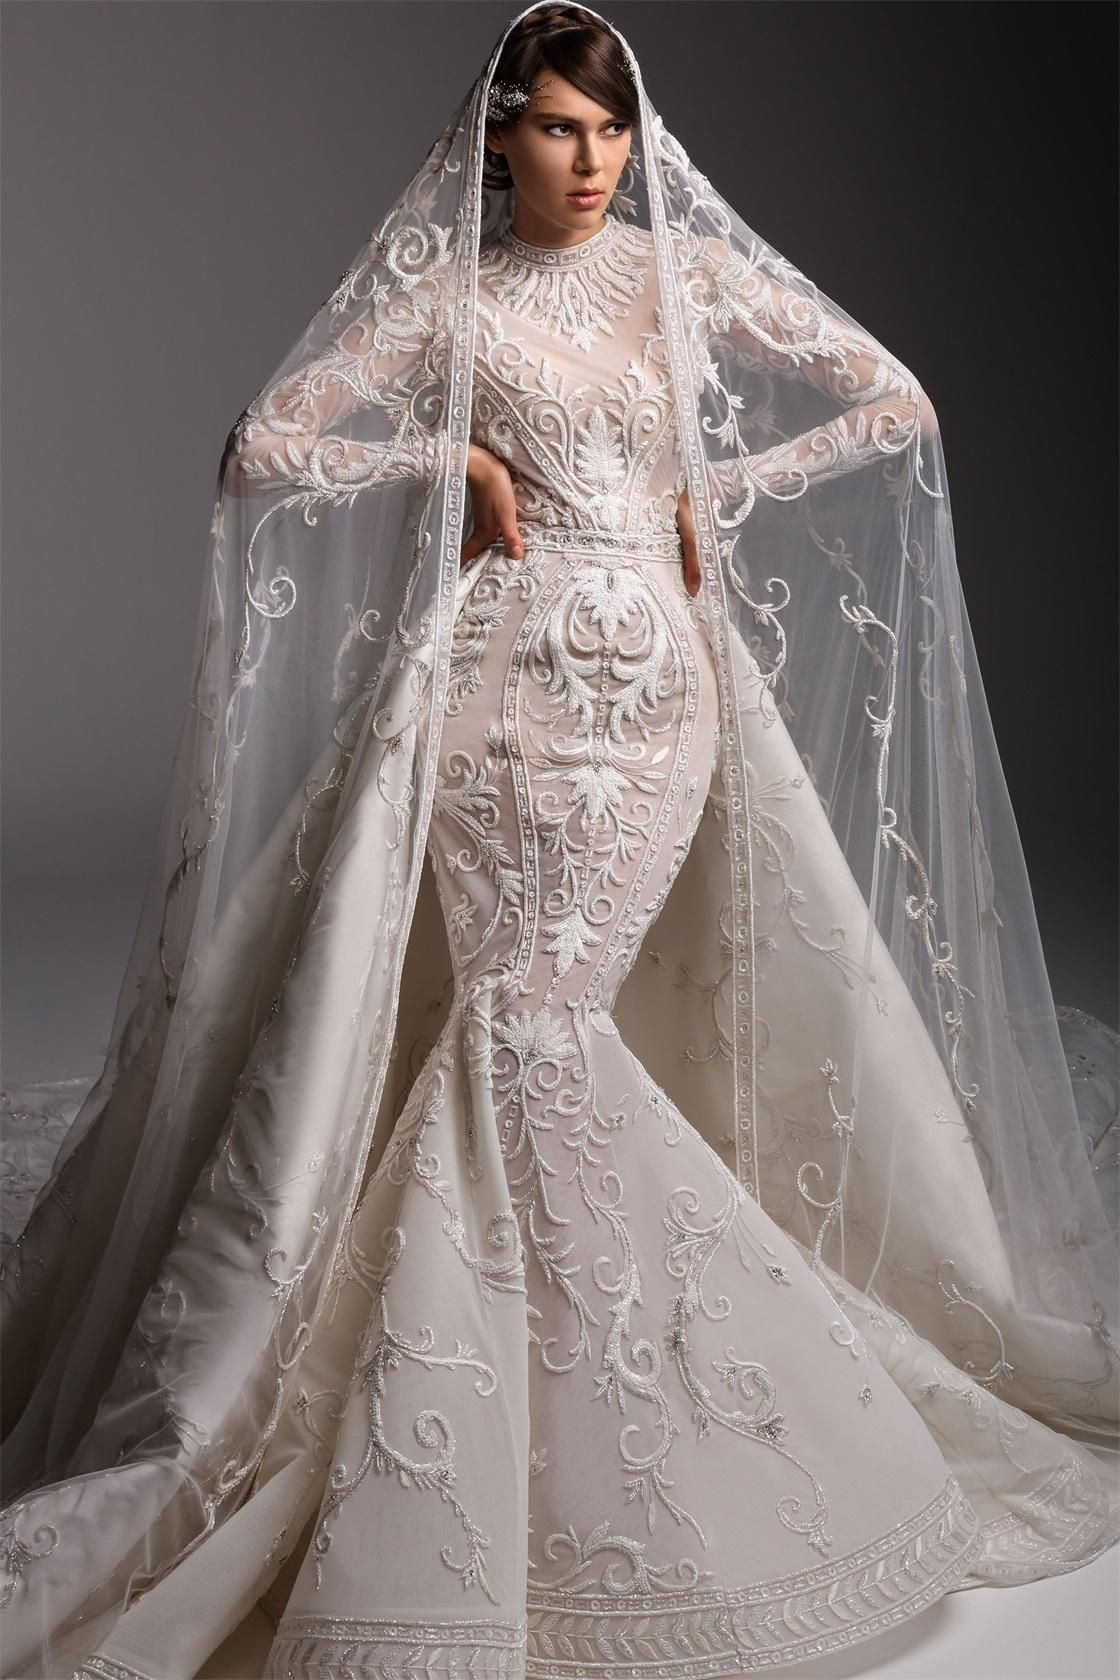 2019 Arabic Mermaid Wedding Dresses Dubai Jewel Neck Sweep Train Long Sleeve Vestito Da Sposa Custo Wedding Dresses Amazing Wedding Dress Wedding Gowns Mermaid [ 1680 x 1120 Pixel ]